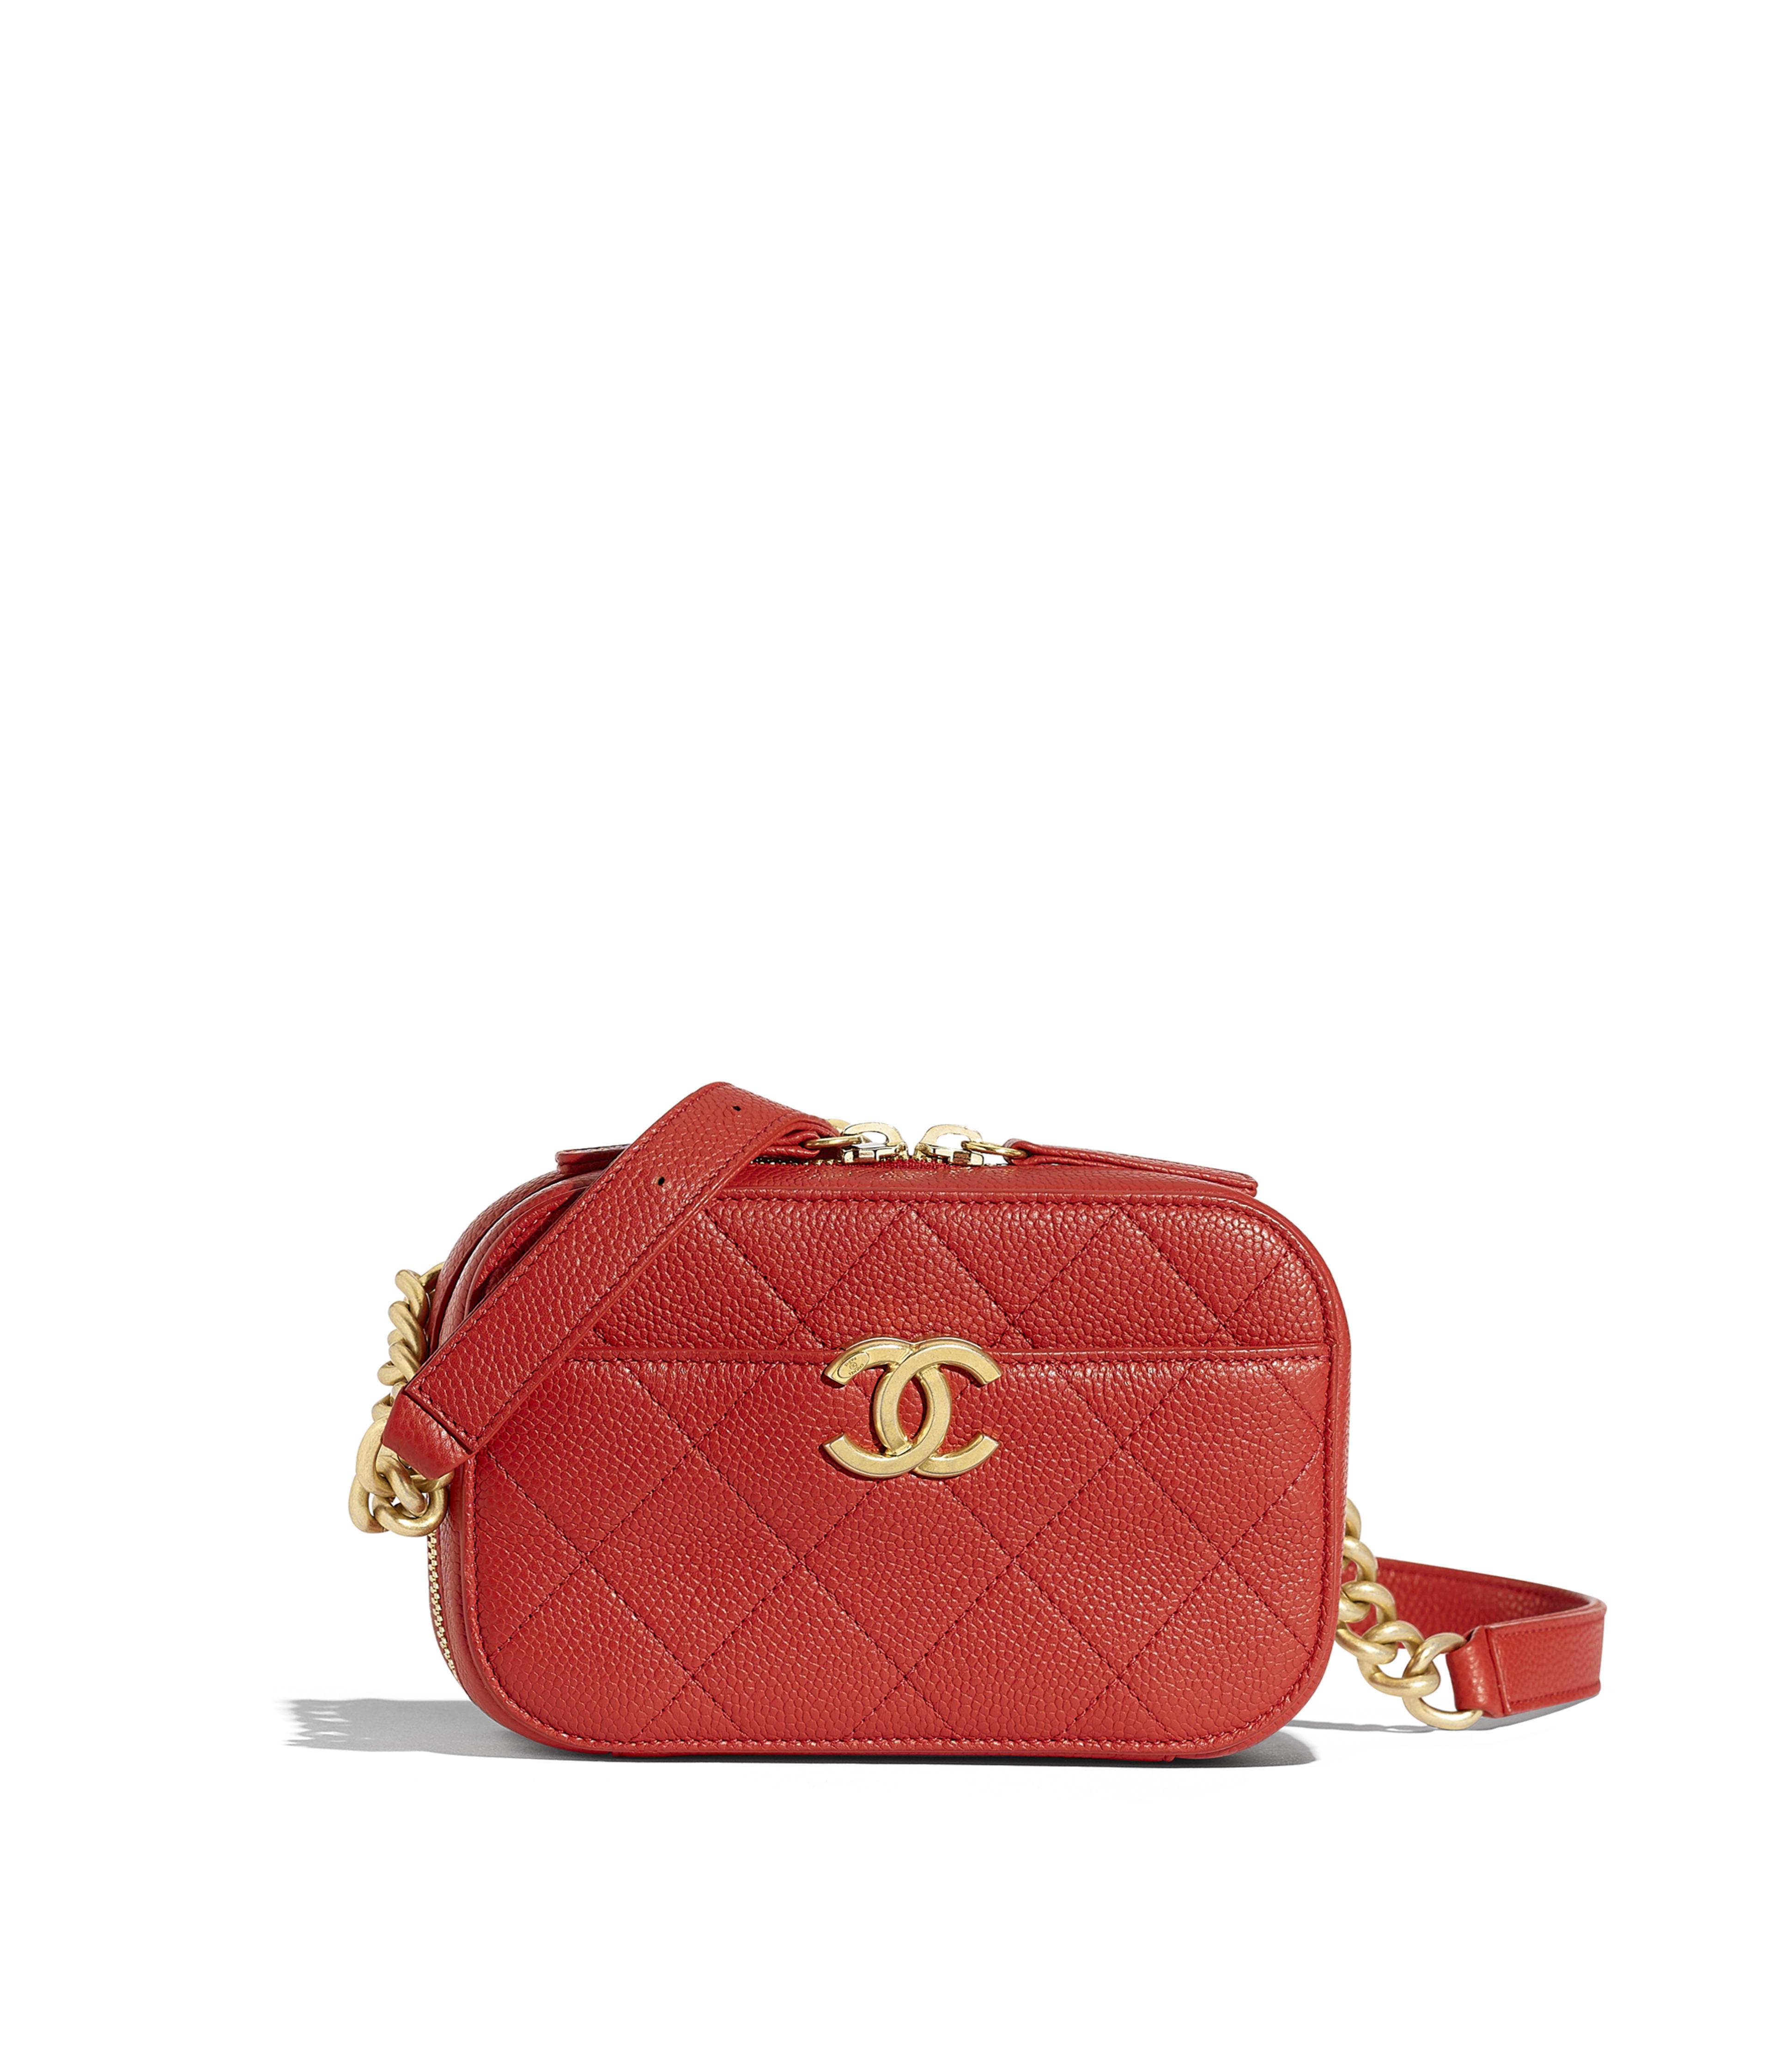 abec39d922aa Waist Bag Grained Calfskin & Gold-Tone Metal, Red Ref. AS0311B00170N0413